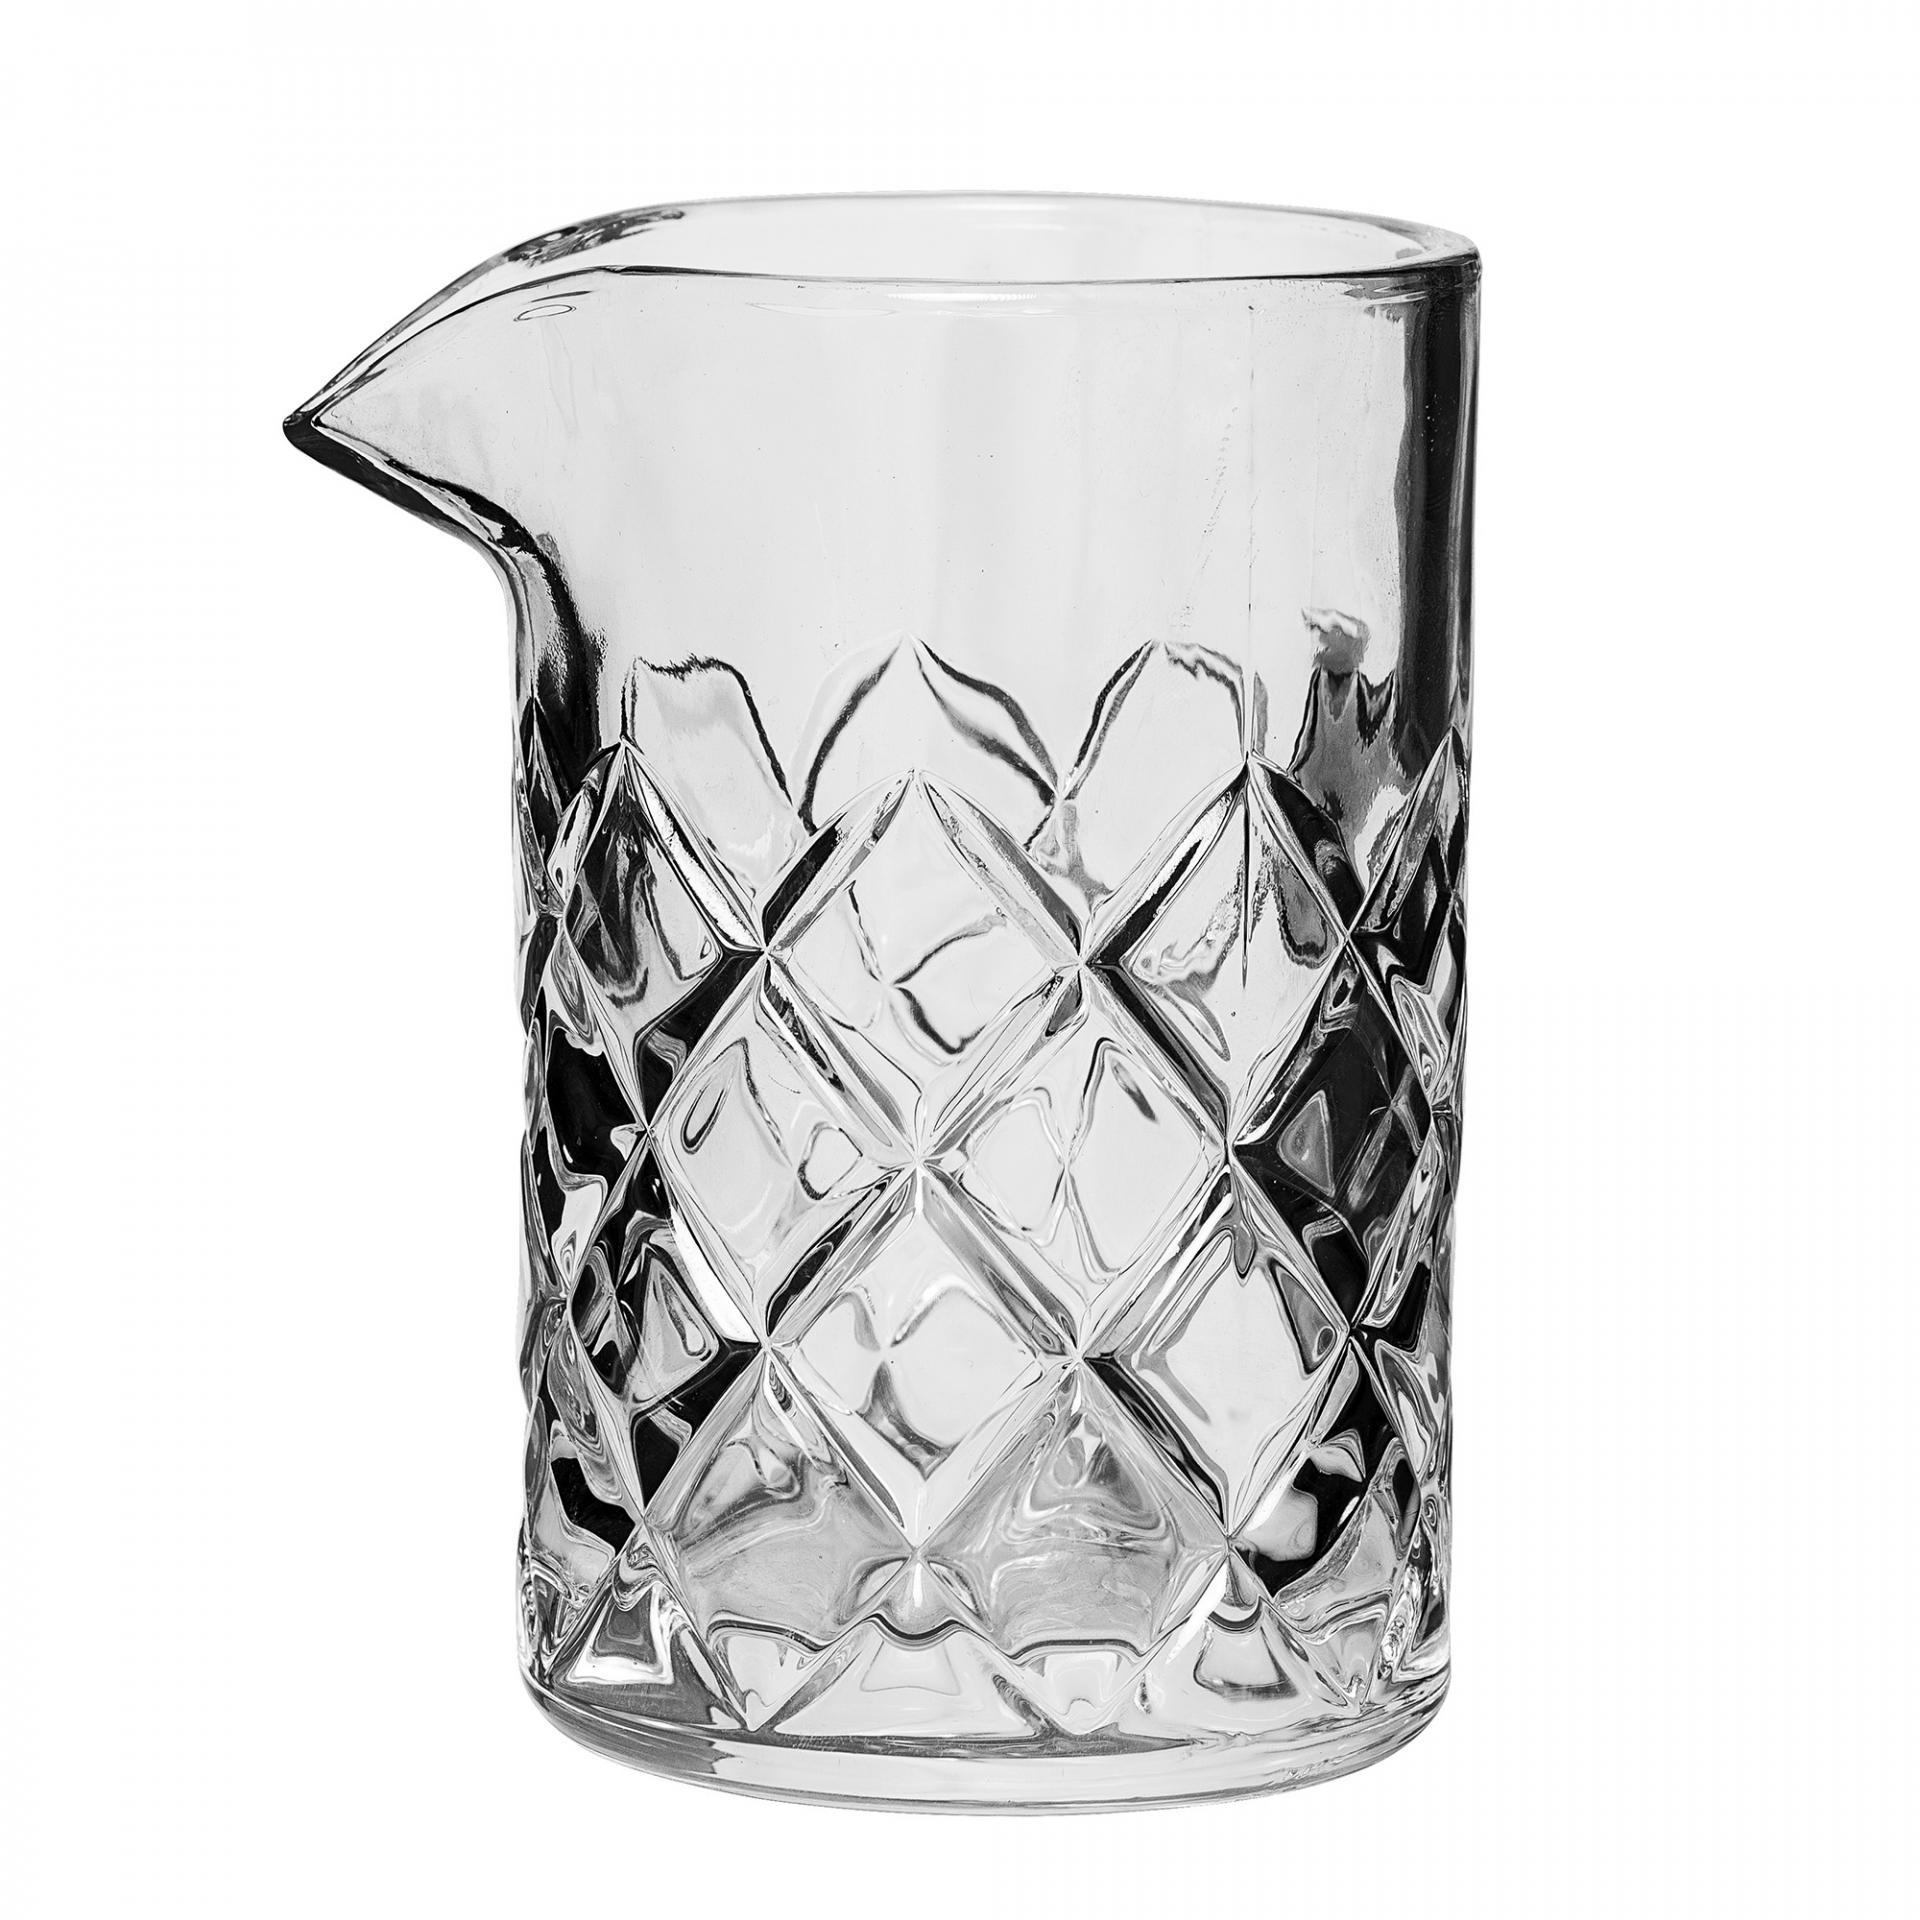 Bloomingville Skleněný džbánek na mléko Clear, čirá barva, sklo